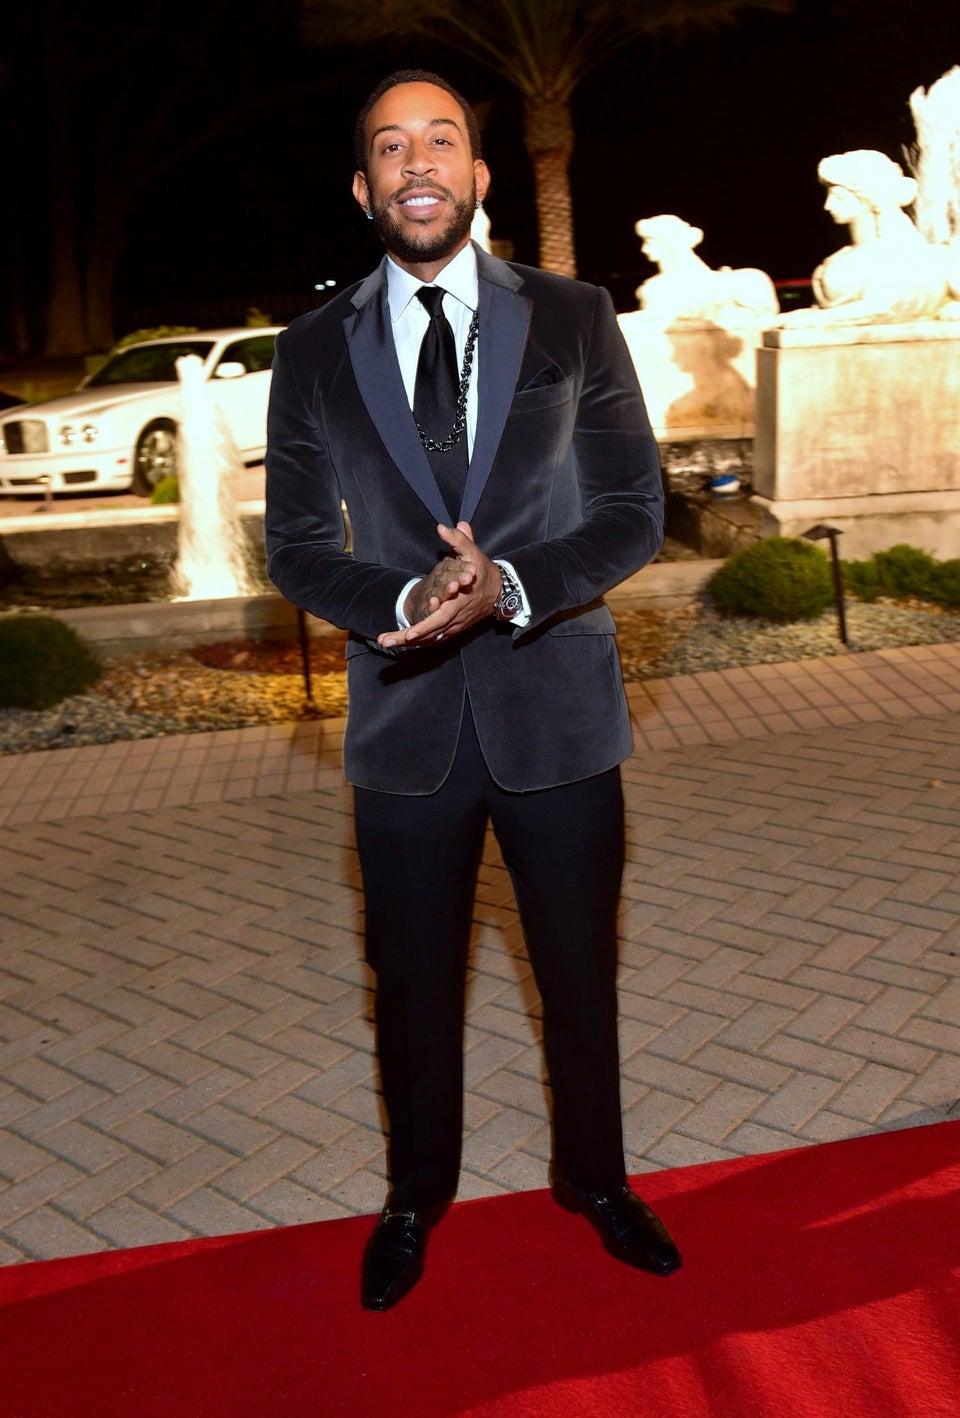 Ludacris and Usher Inspire Children in Atlanta